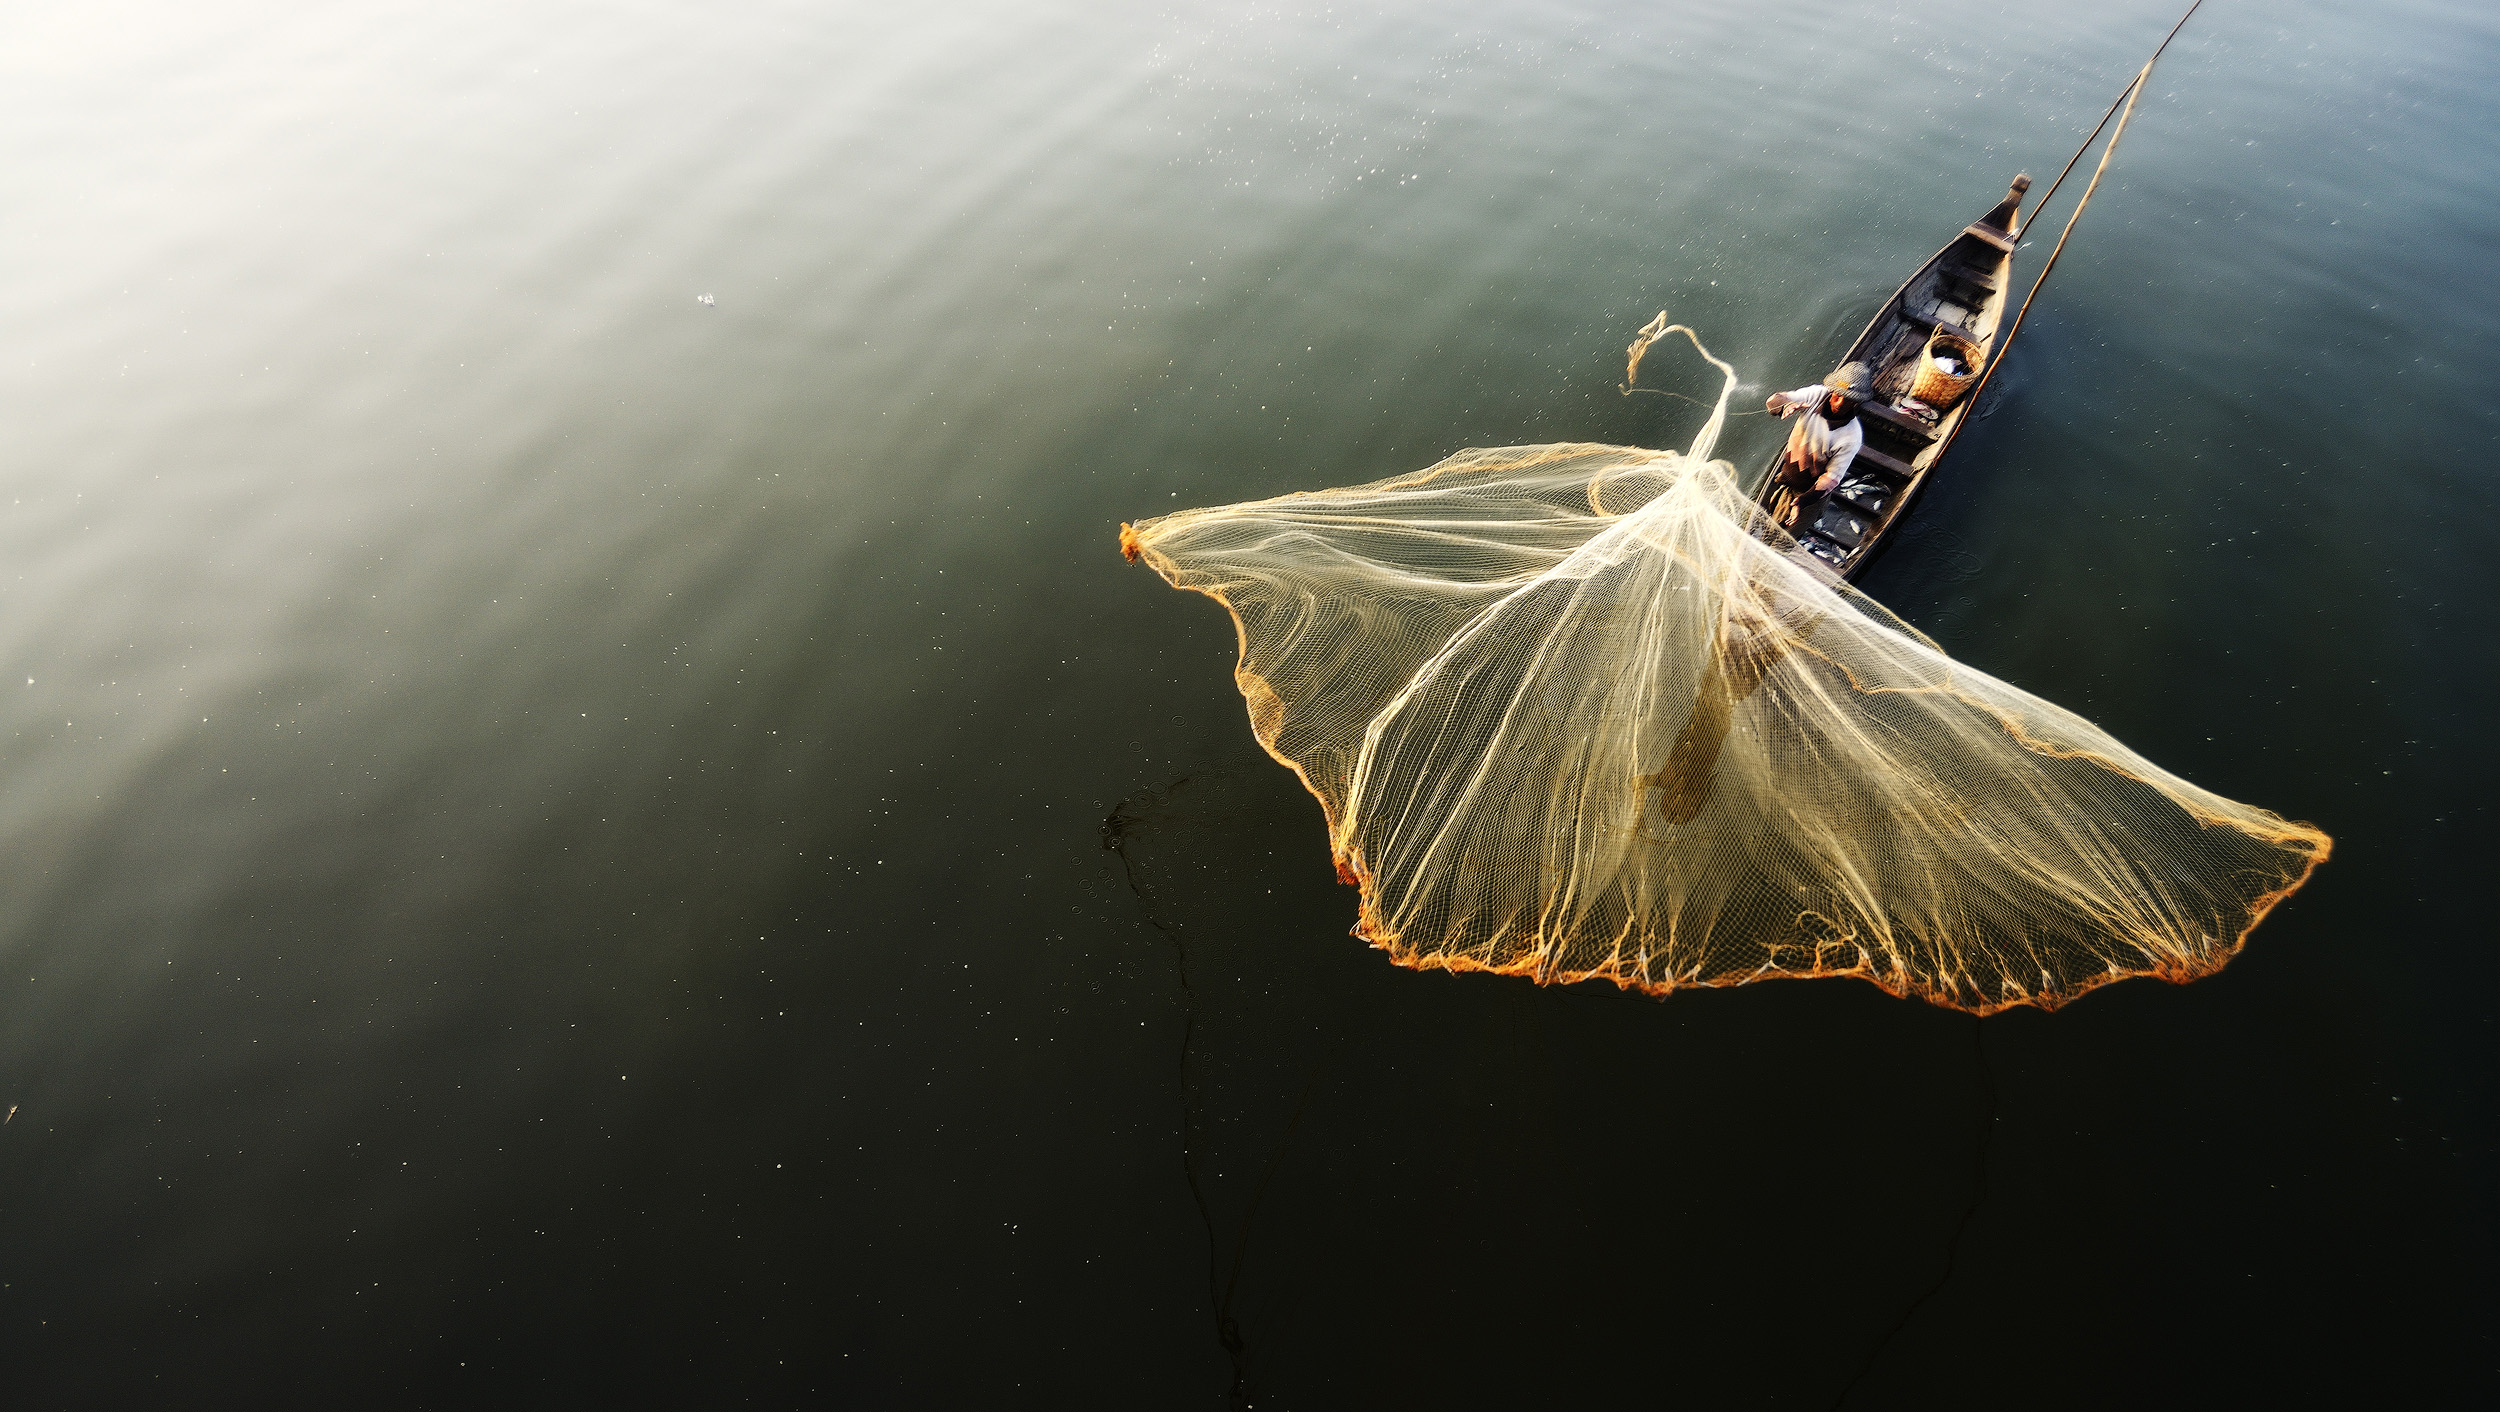 U Bein Fisherman   A fisherman casts his nets below U Bein bridge in Amarapura.